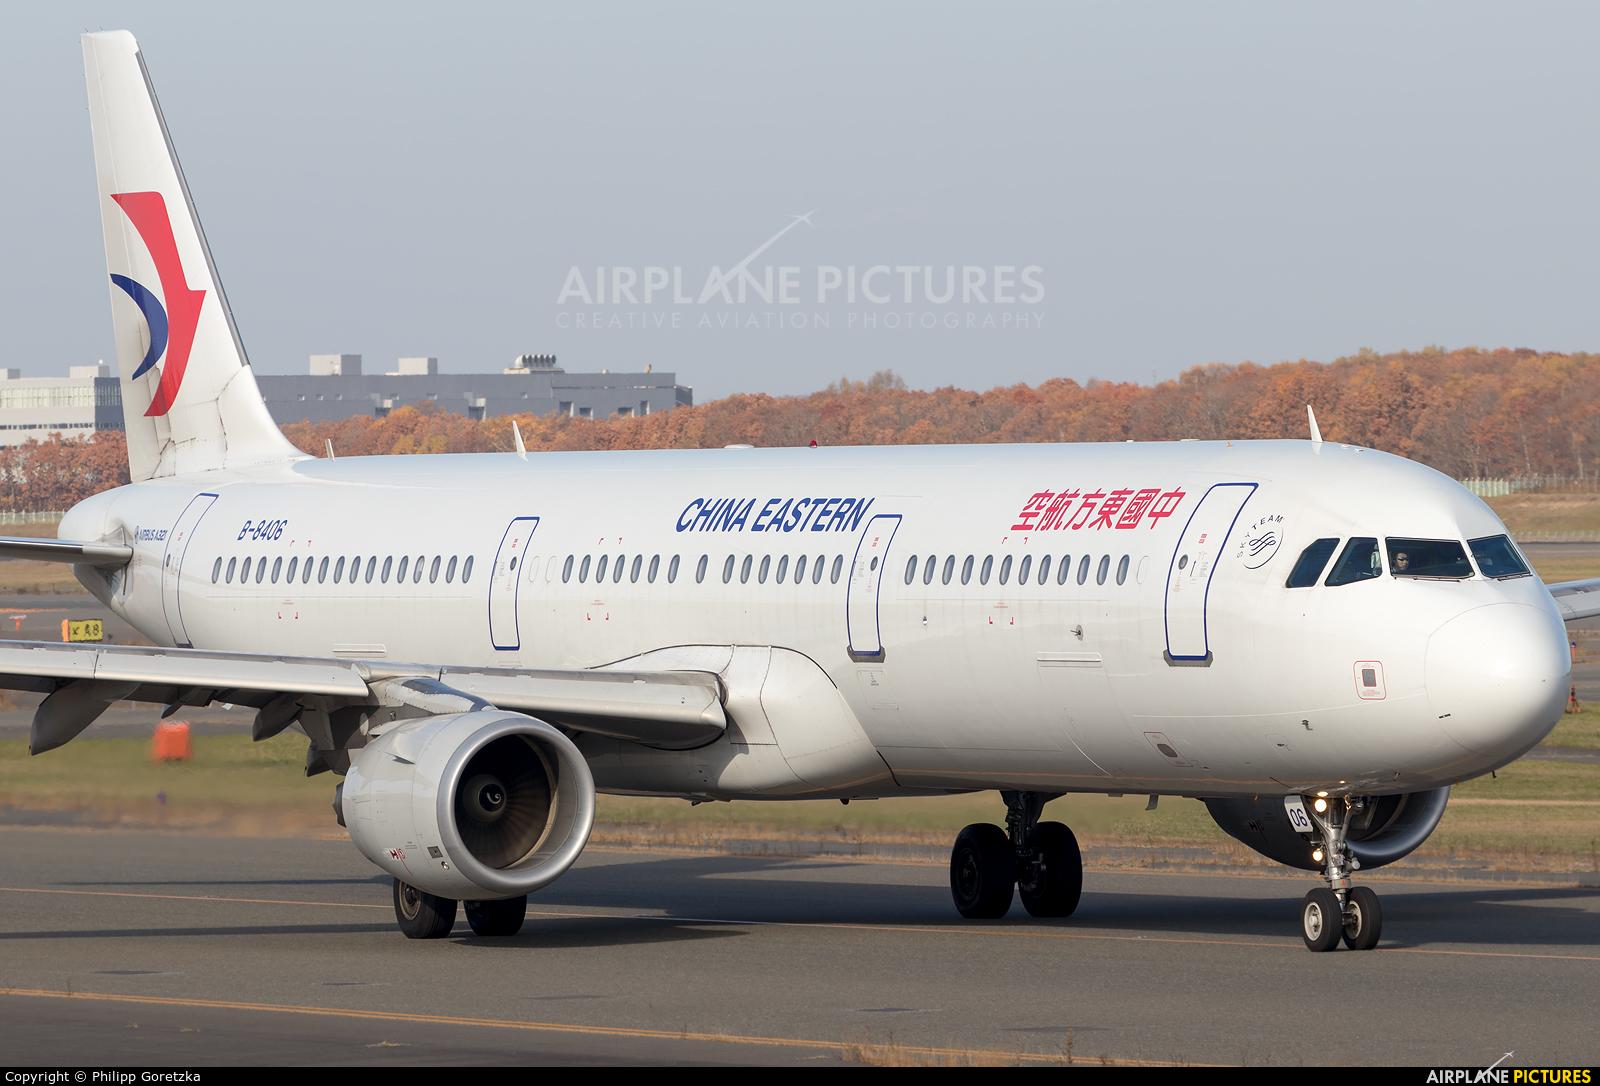 China Eastern Airlines B-8406 aircraft at New Chitose